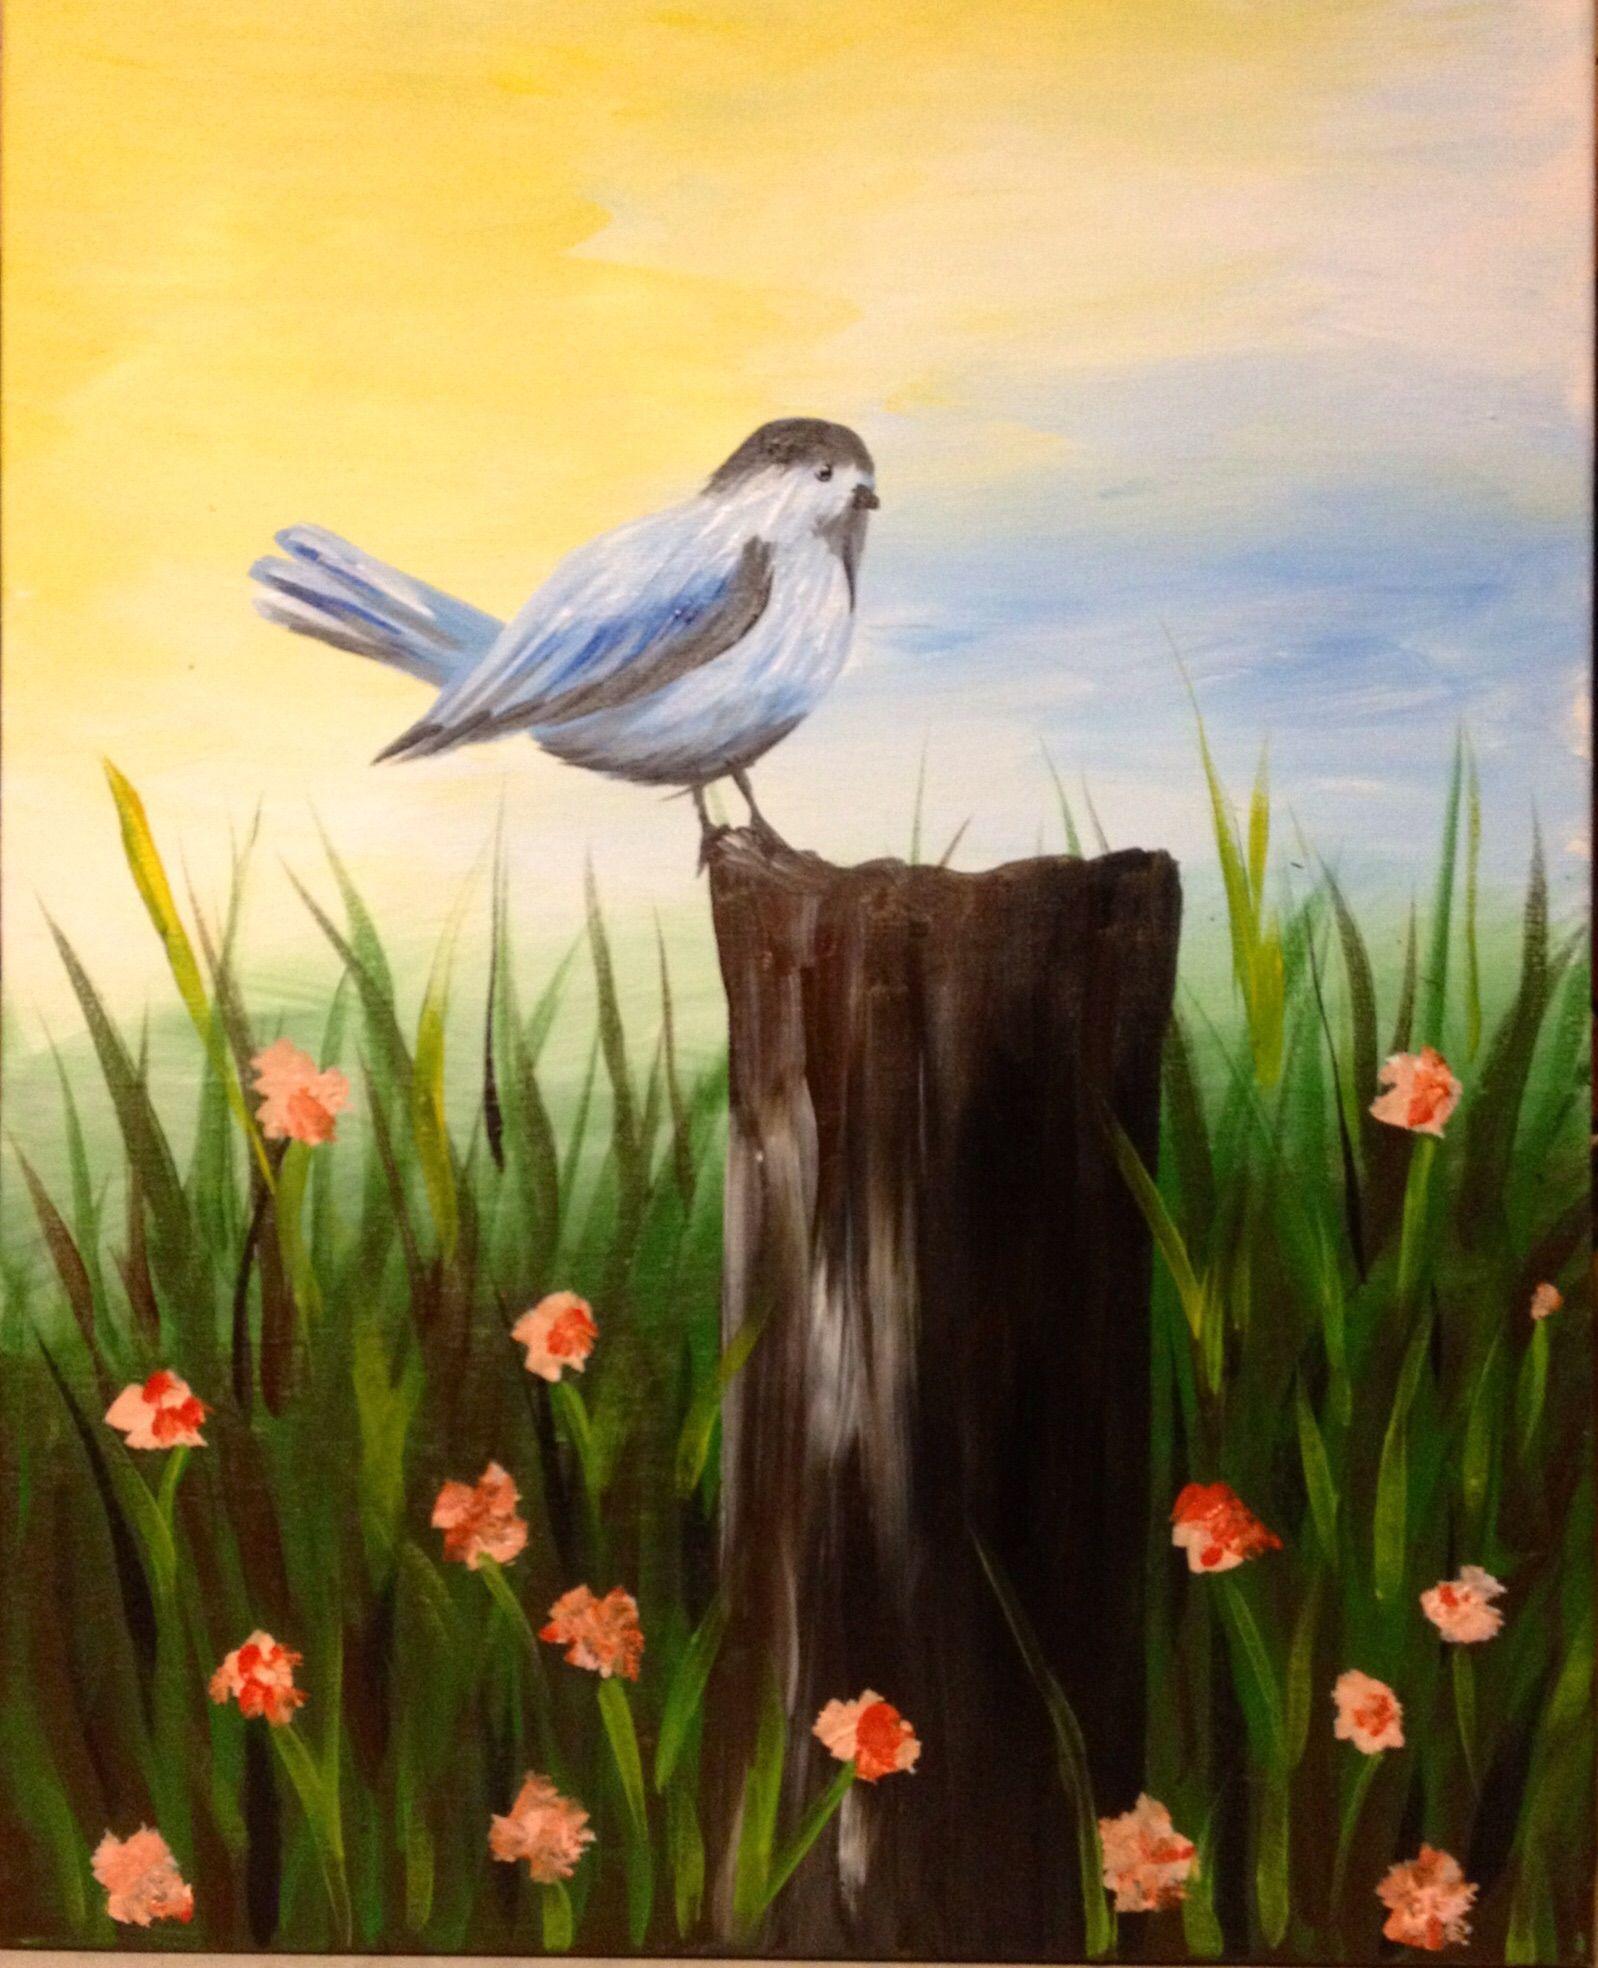 Little Bird Singing On A Stump In Flower Field Cute Beginner Canvas Painting